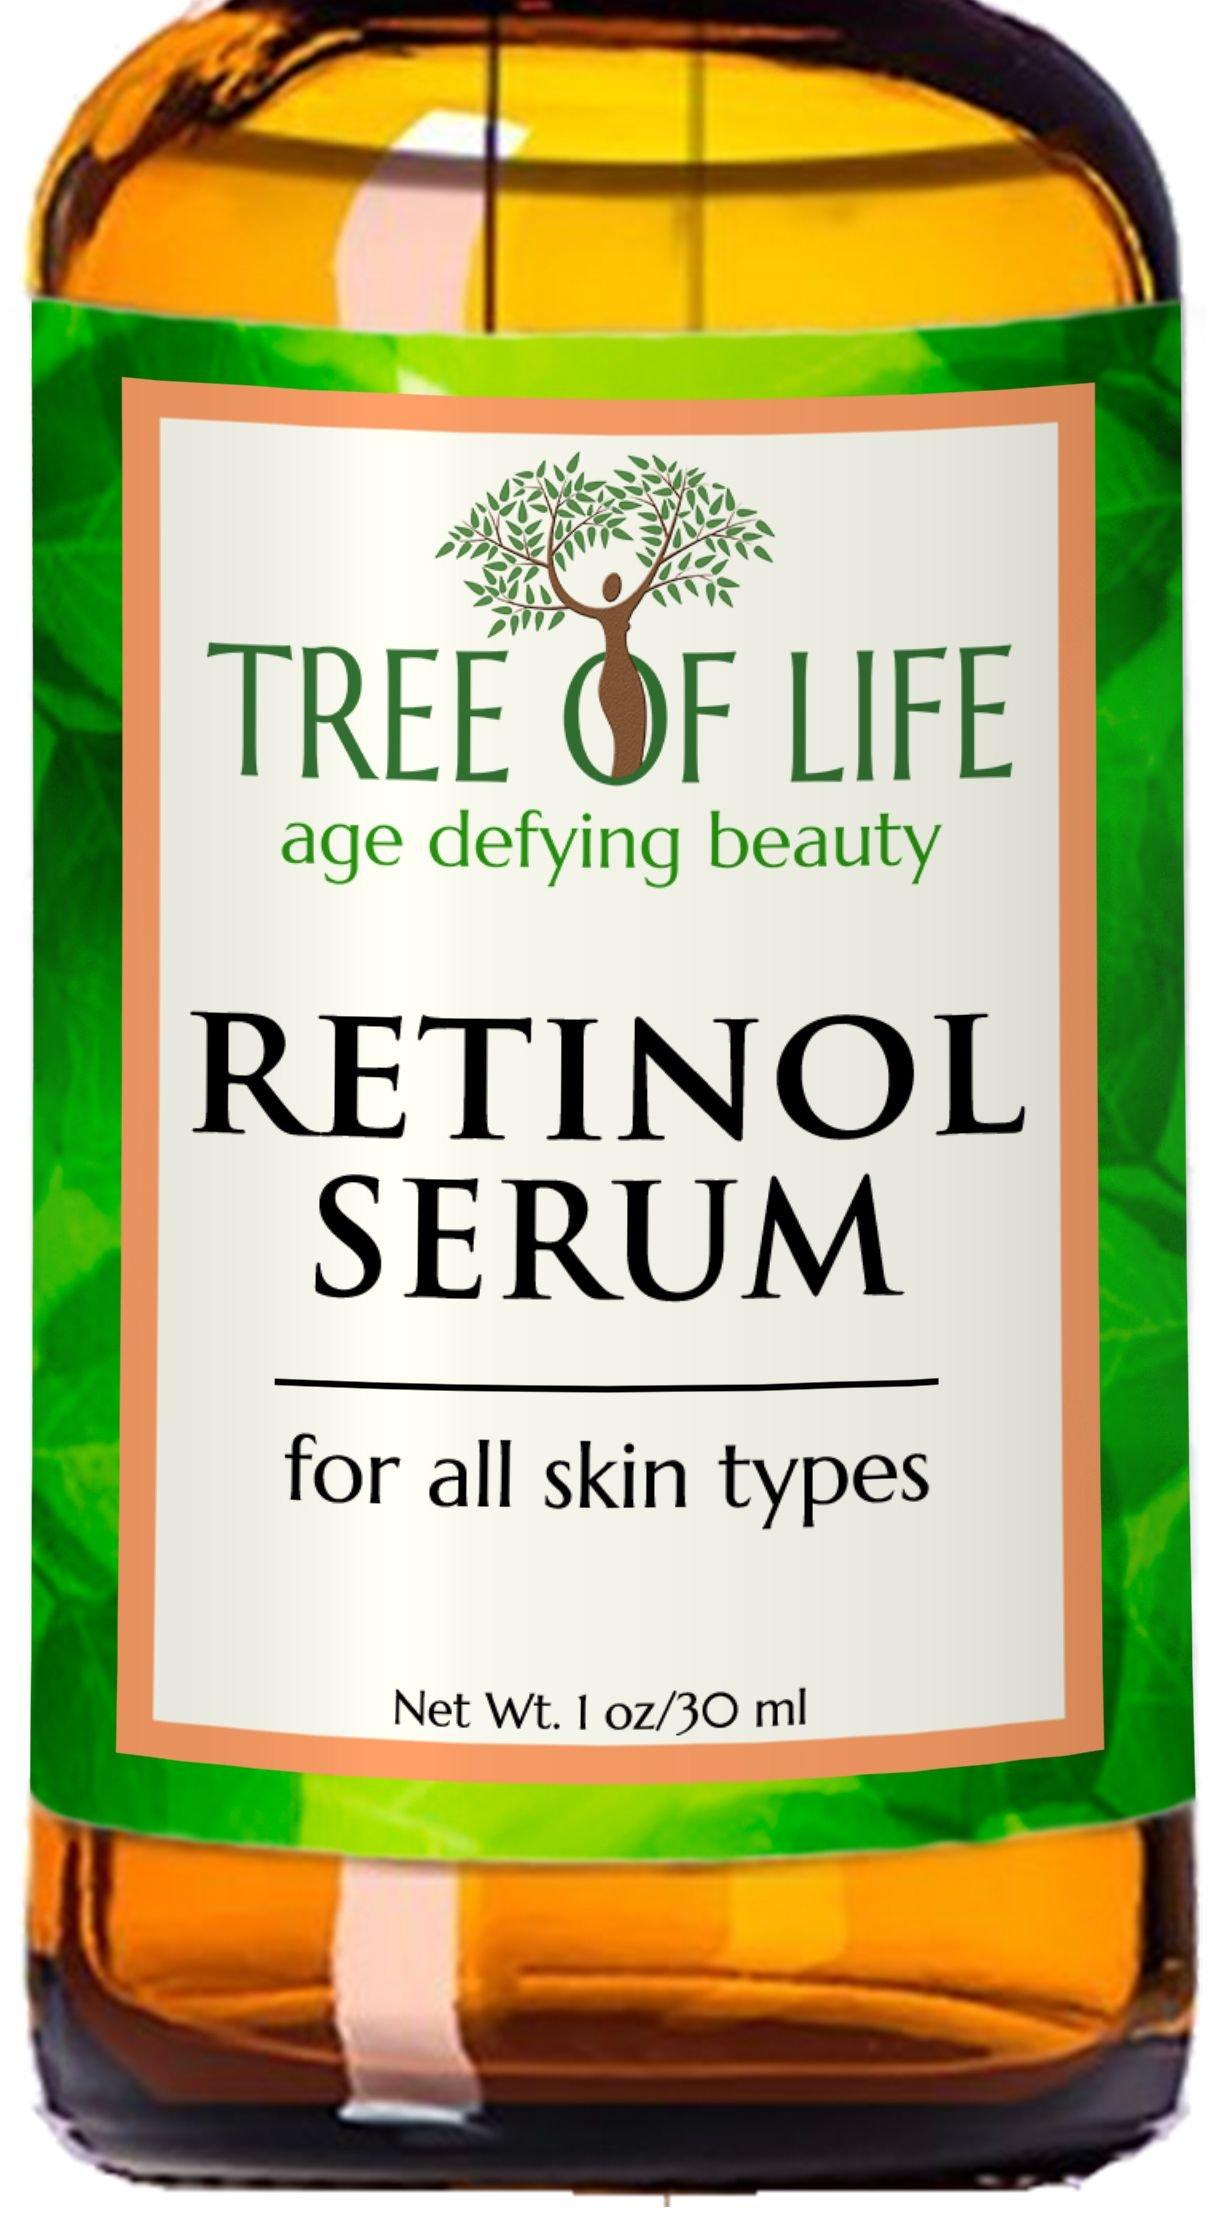 ToLB Retinol Serum - 72% ORGANIC - Clinical Strength Retinol Serum Face Moisturizer Cream for Anti Aging, Anti Wrinkle, Acne - Organic and Natural Ingredients - 1 oz